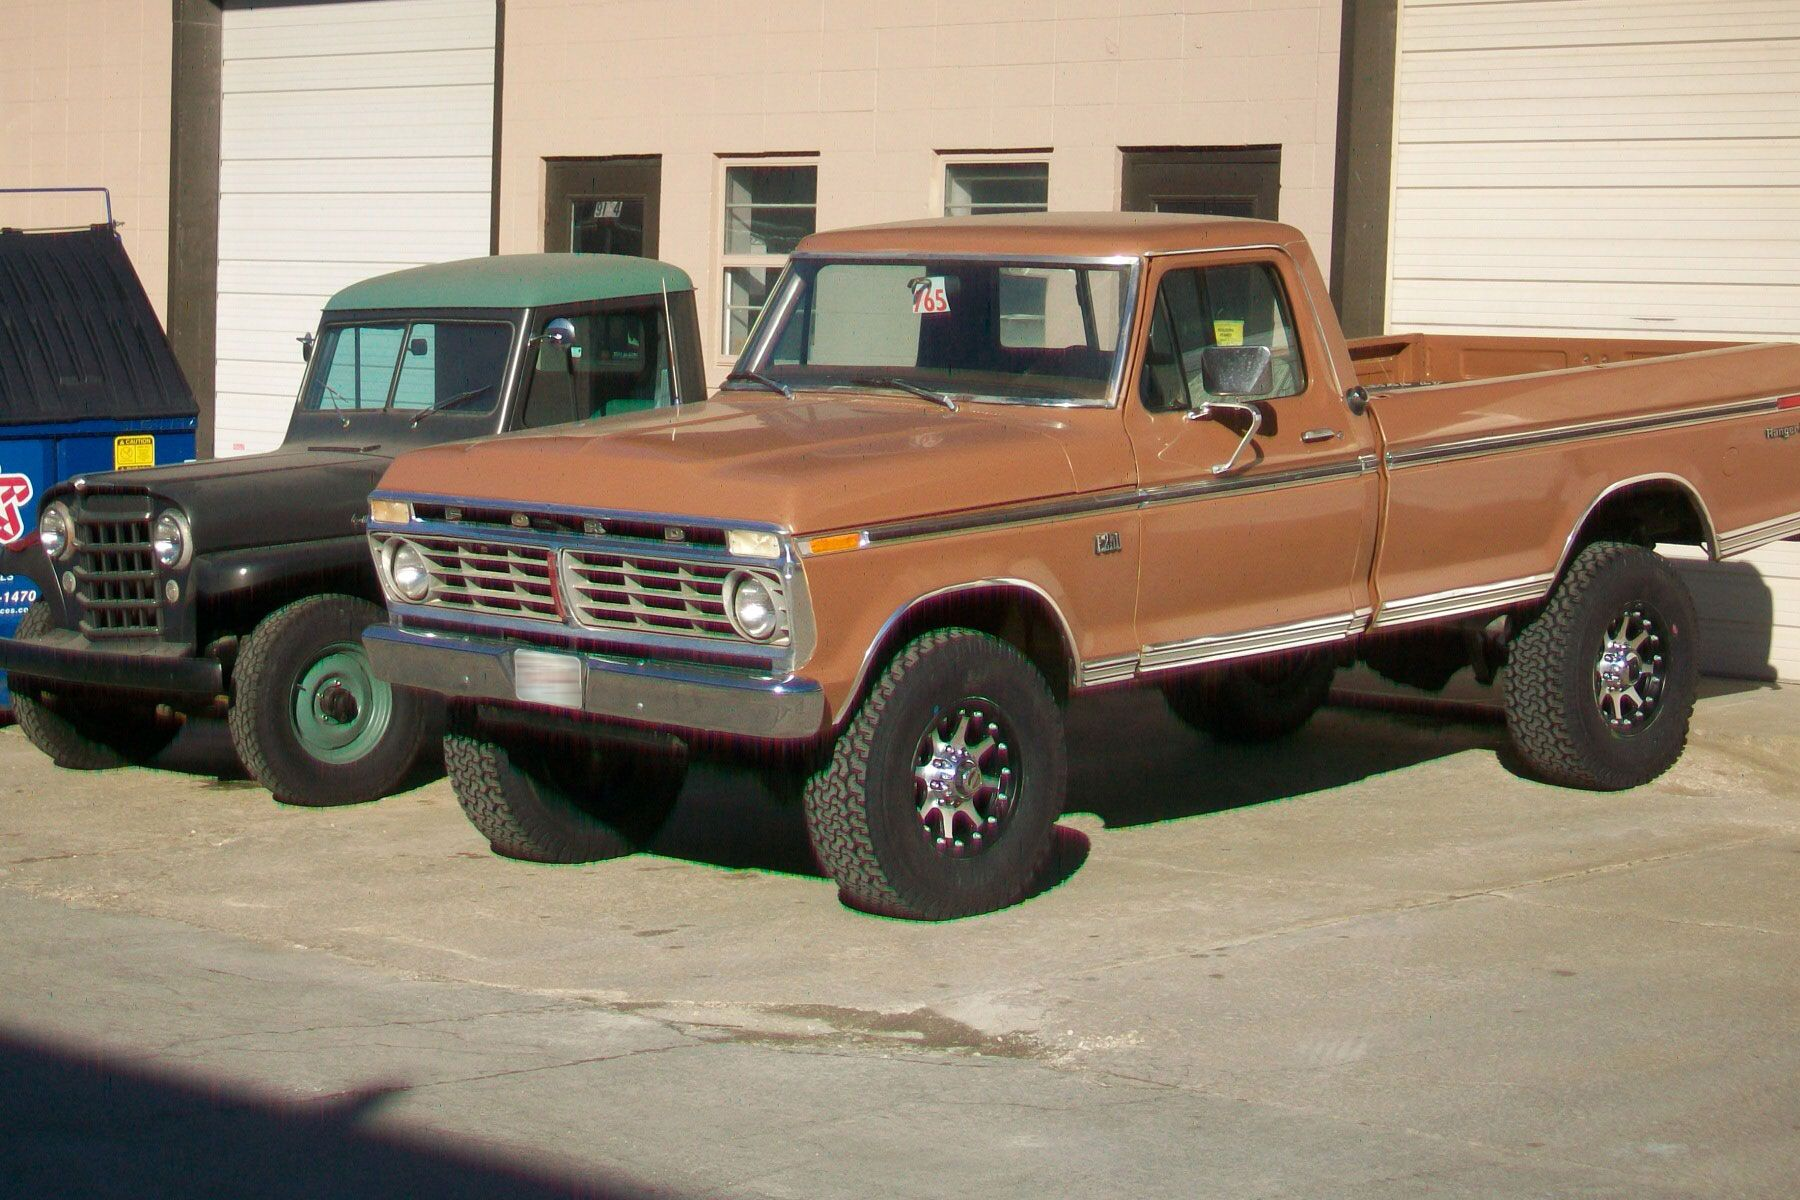 Jessica Vanderpool & her 75 Ford — LMC Trucklife